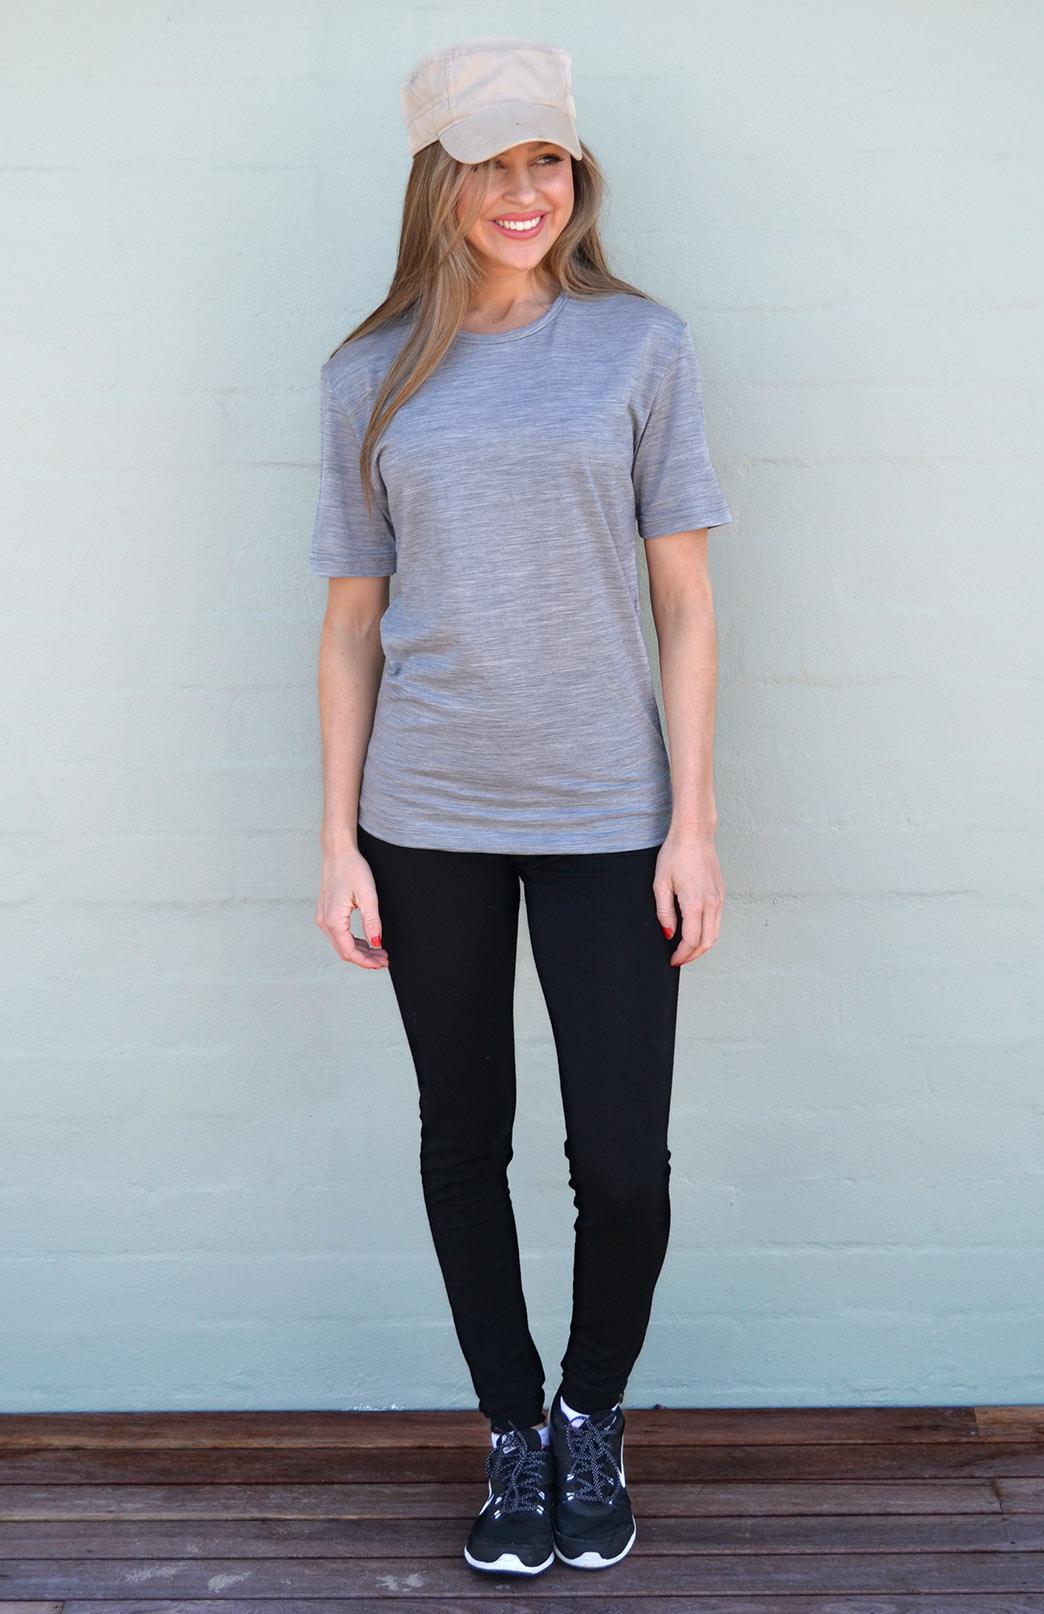 Women's Crew Neck T-Shirt - 170g - Smitten Merino Tasmania Australia